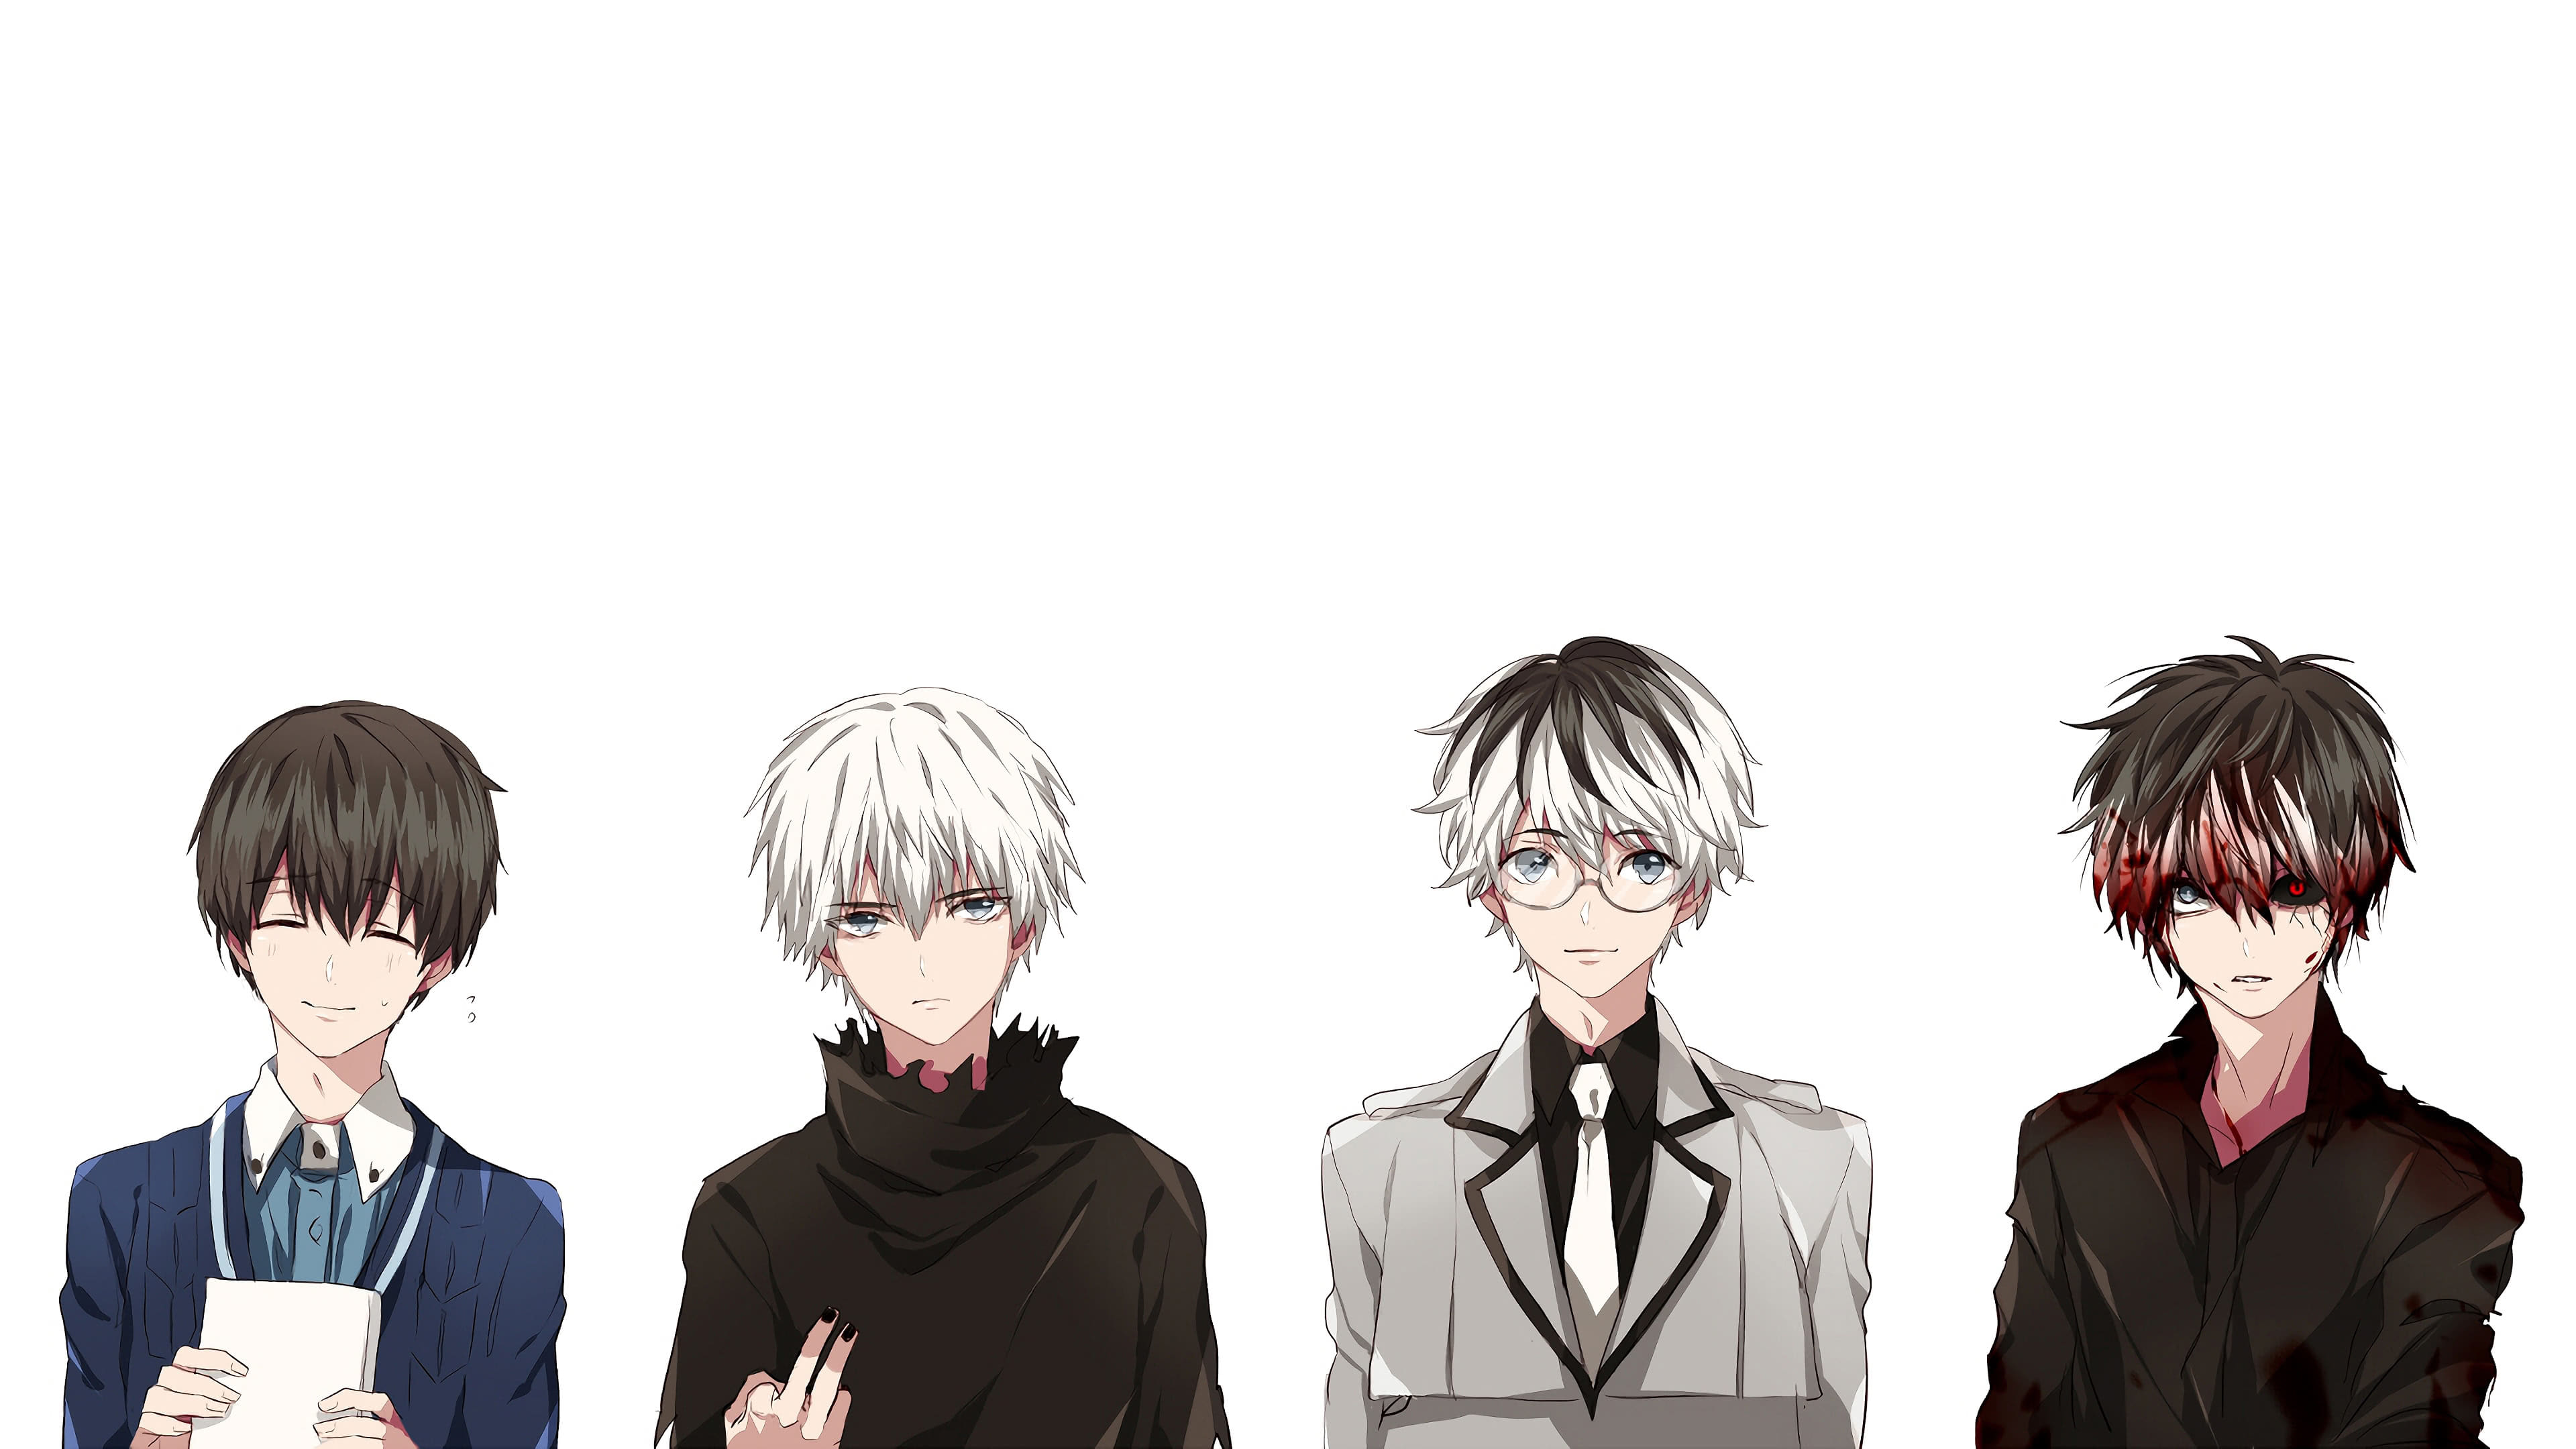 Tokyo Ghoul Ken Kaneki Personalities UHD 4K Wallpaper | Pixelz